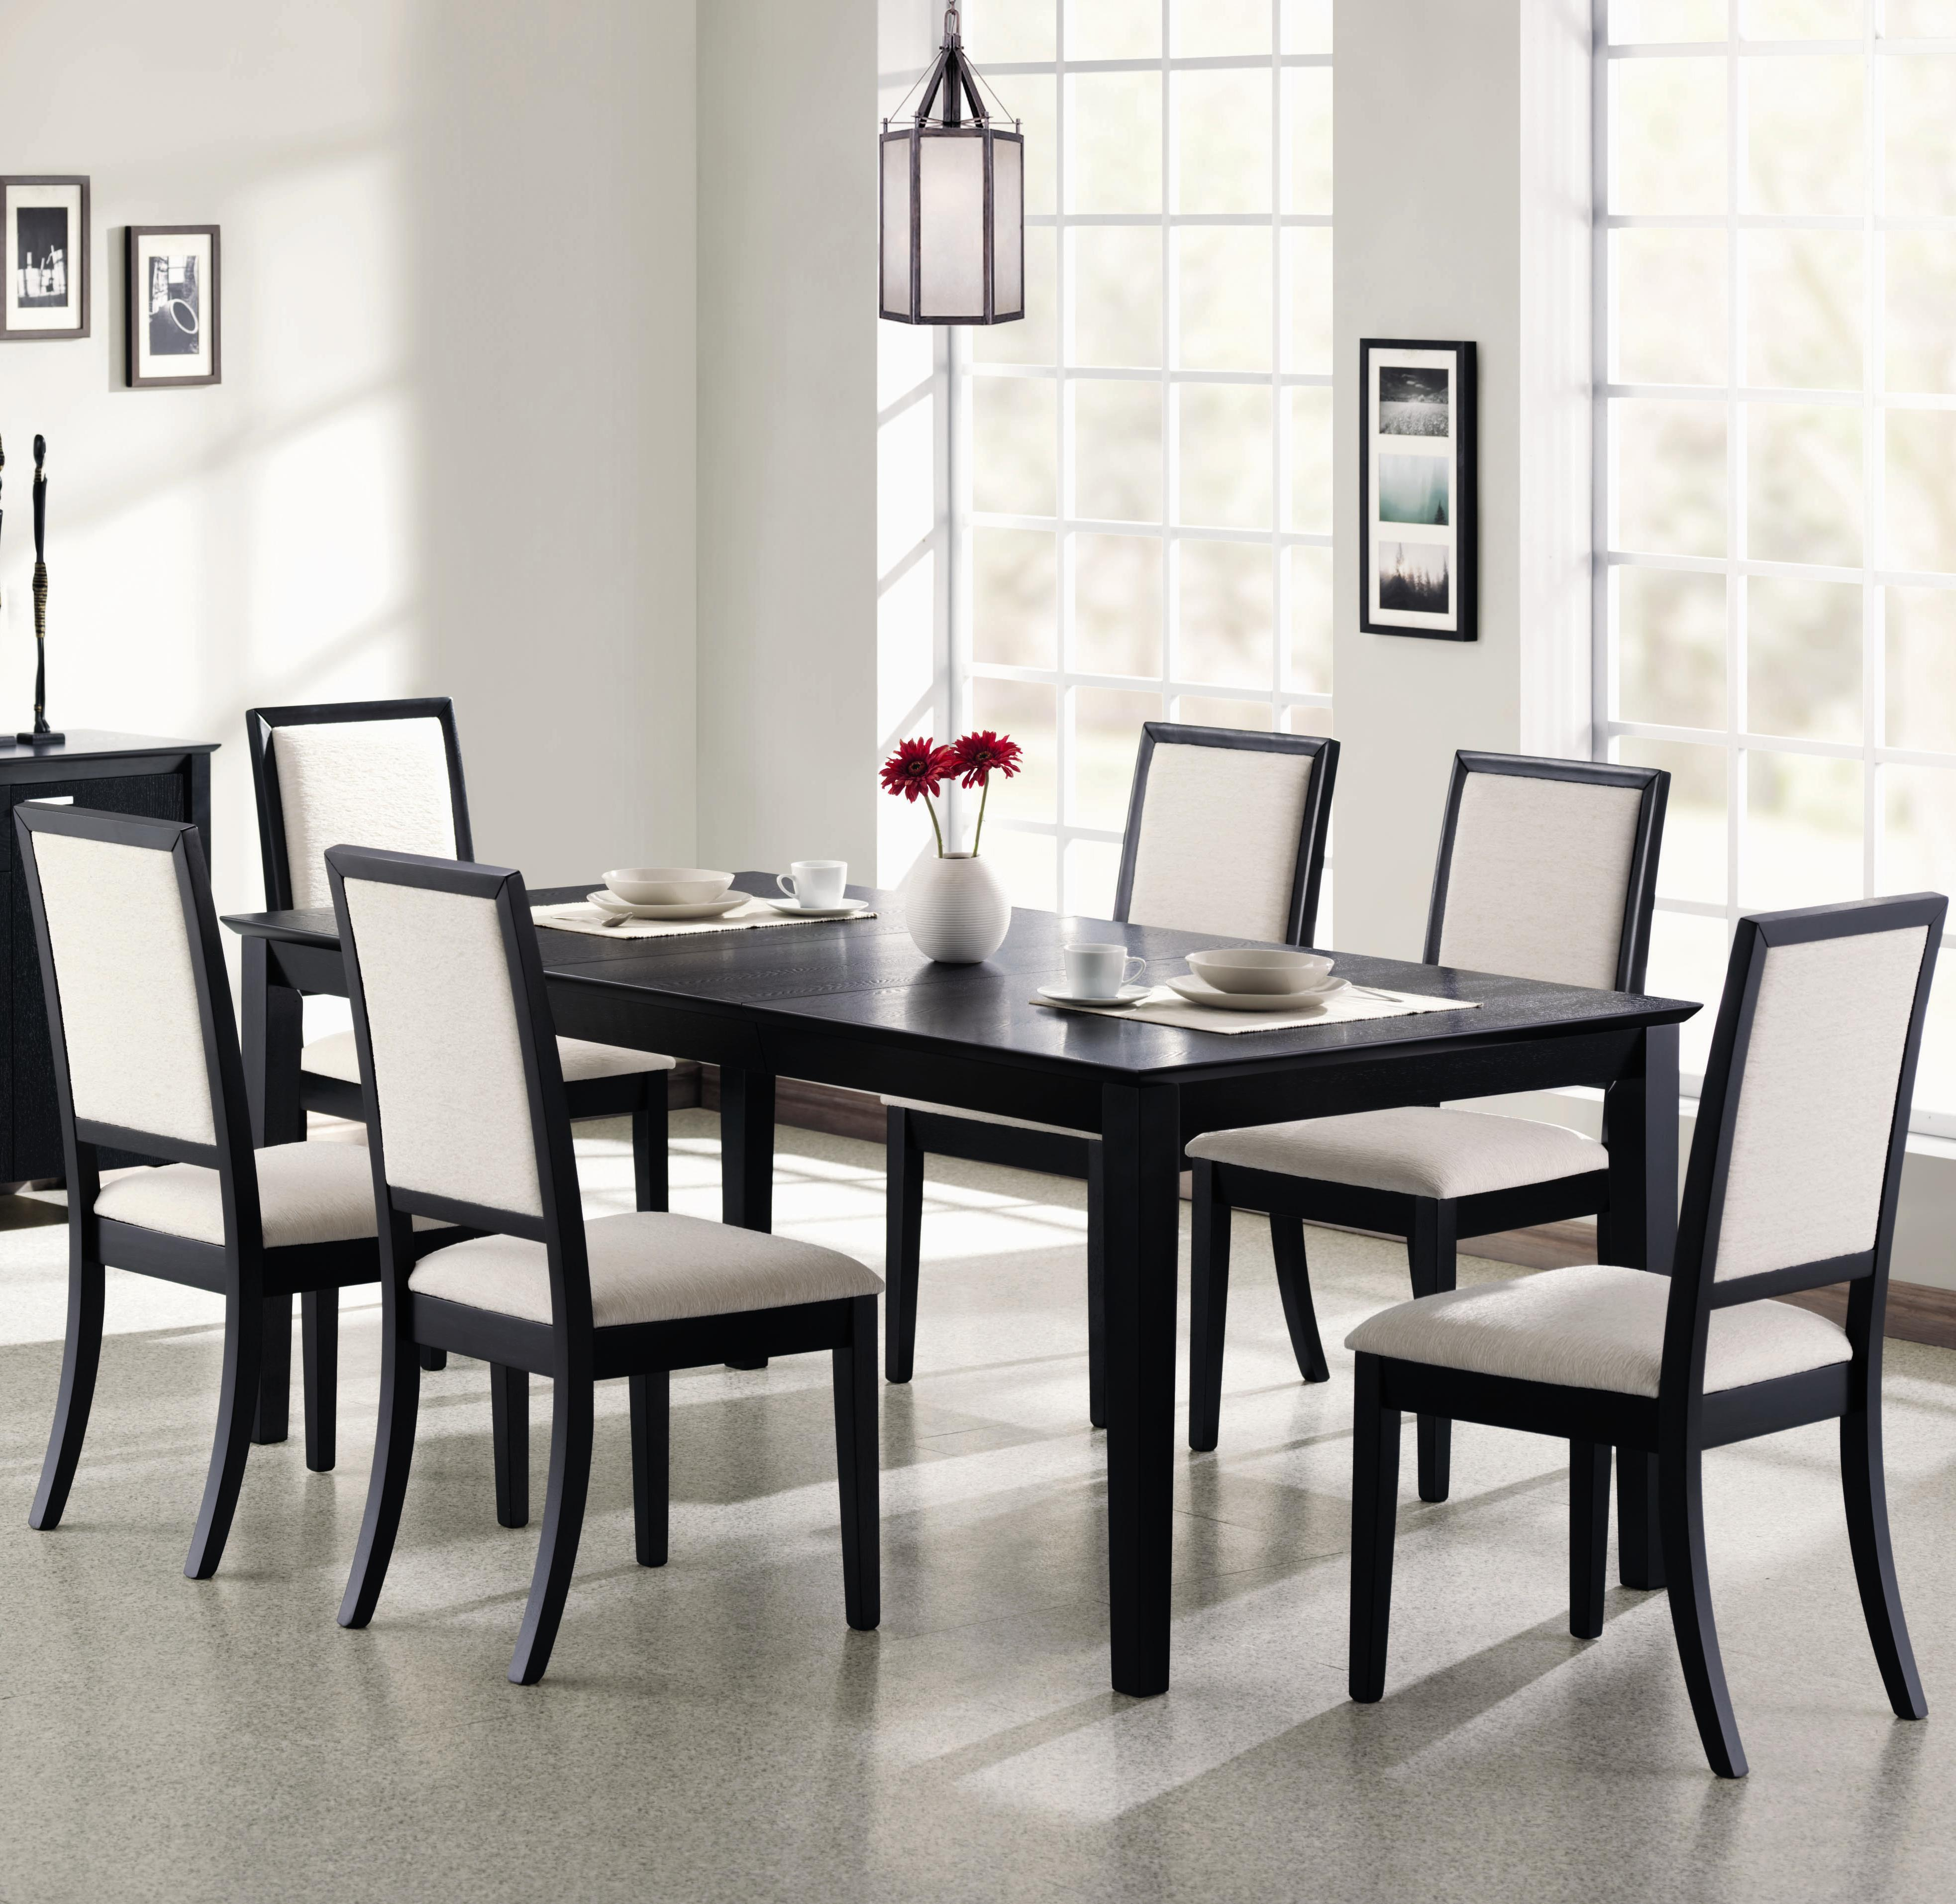 Coaster Lexton 7 Piece Dining Set - Item Number: 101561+6x2